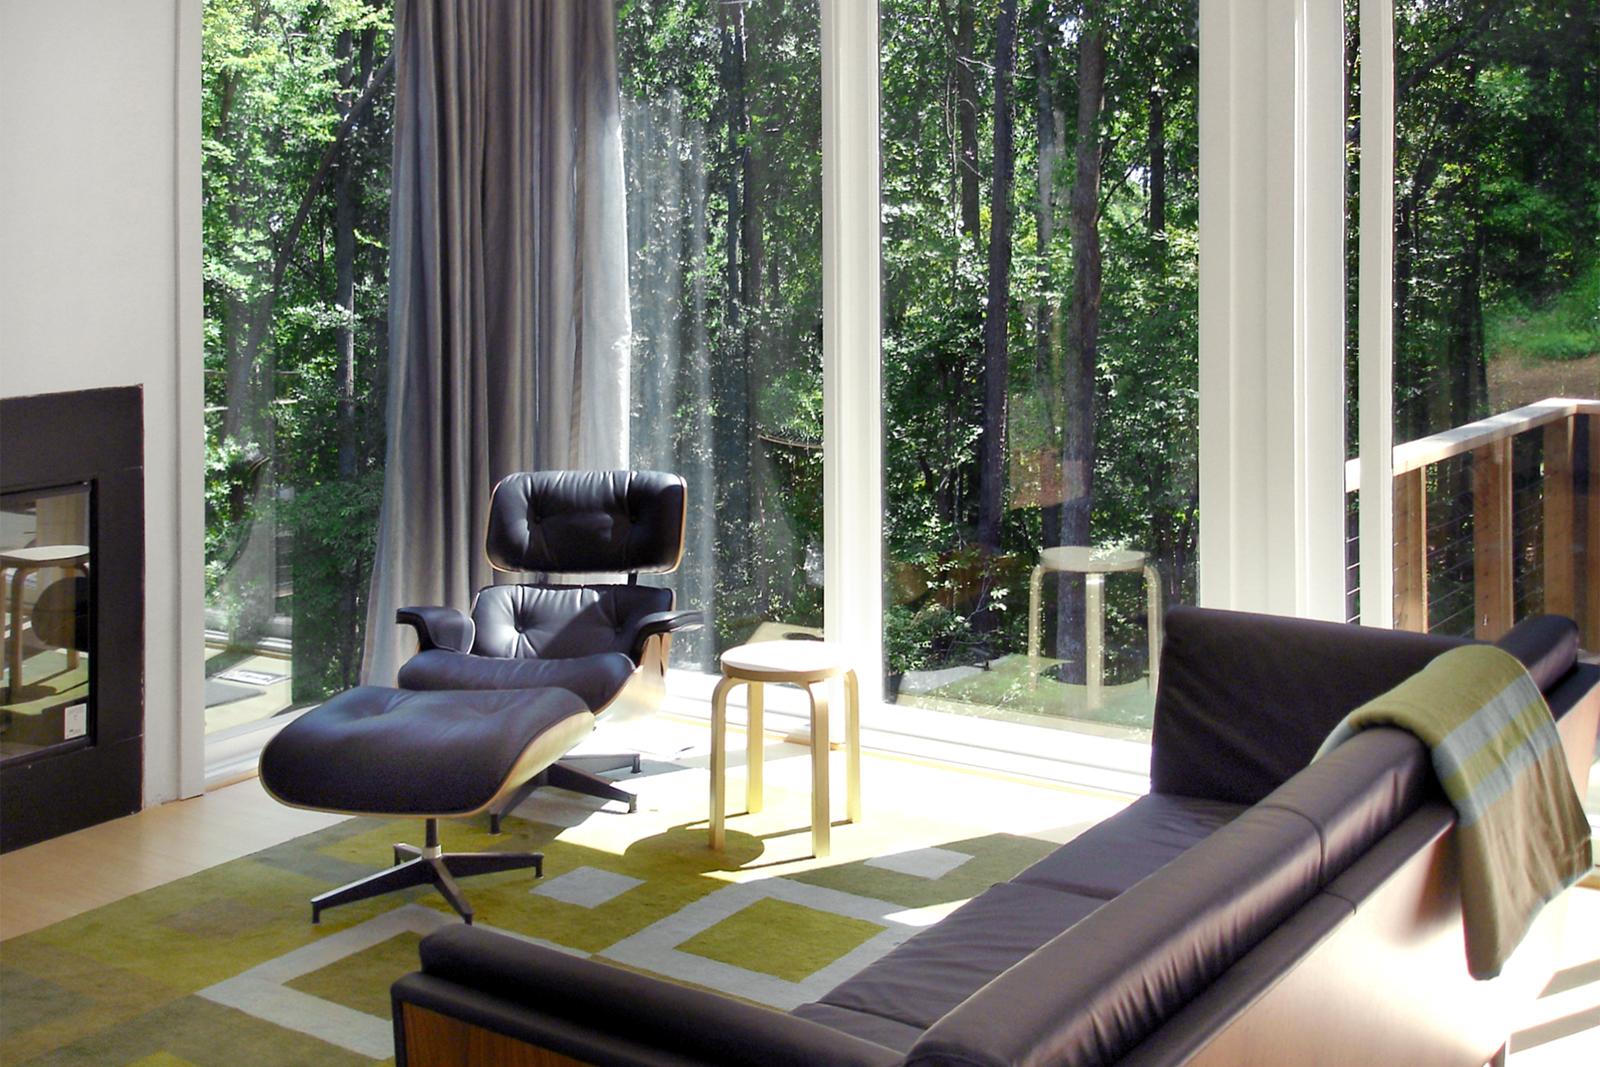 12-res4-resolution-4-architecture-modern-modular-house-prefab-dwell-home-interior.jpg